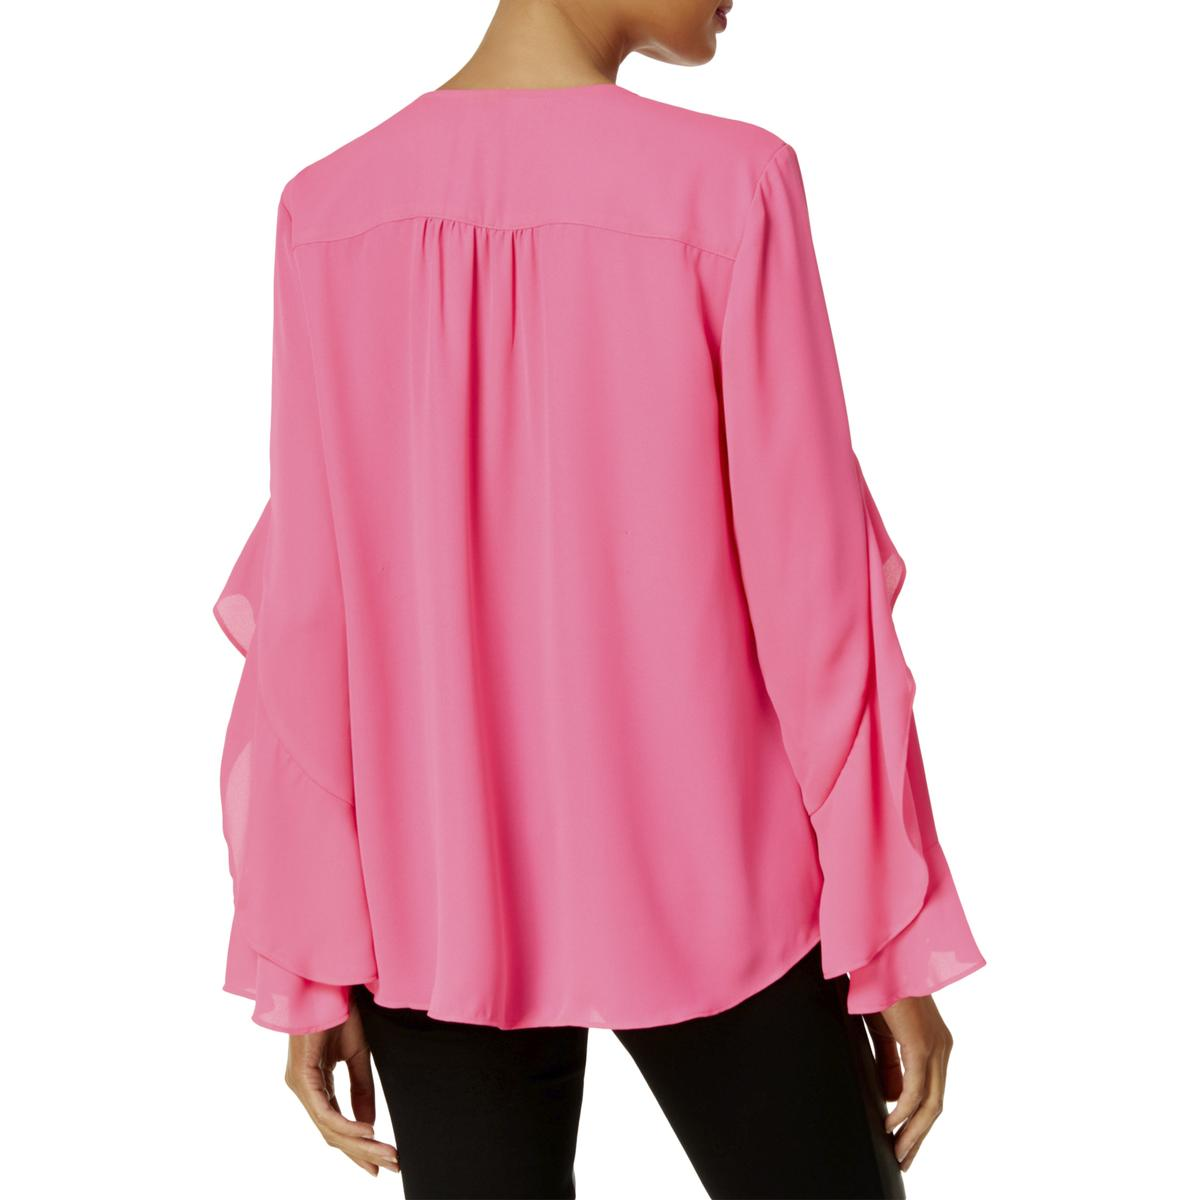 INC-Womens-Surplice-Ruffled-Bell-Sleeves-Blouse-Top-BHFO-1627